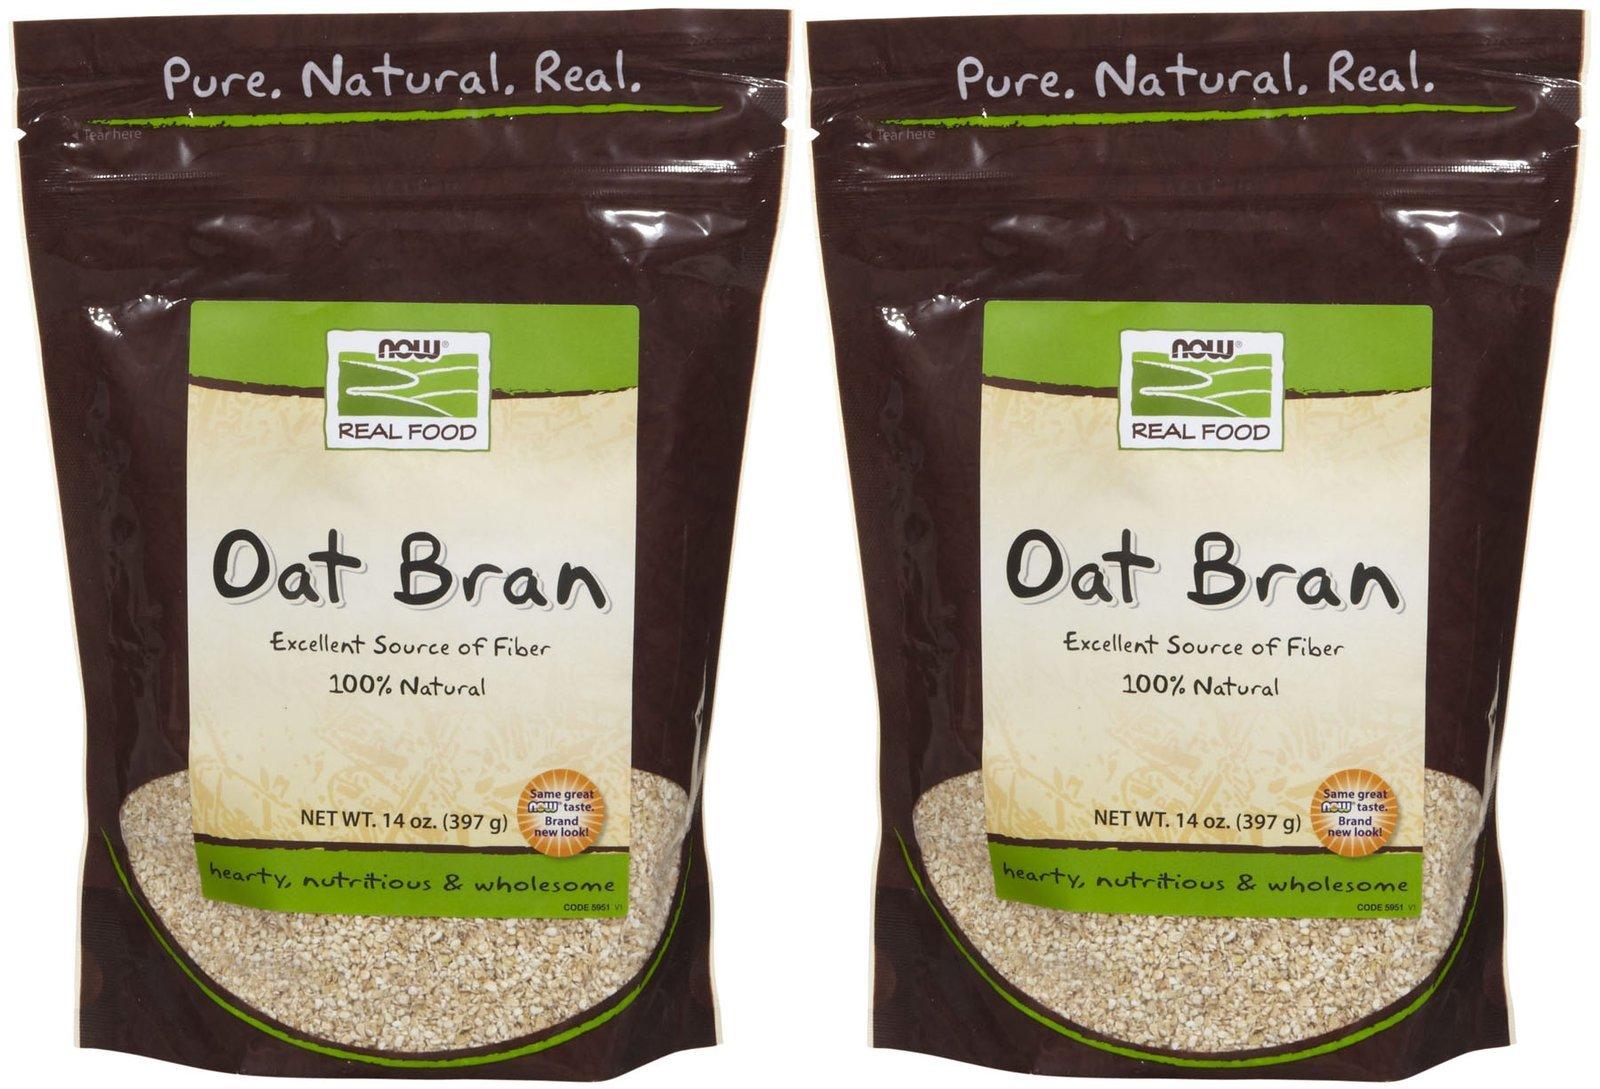 NOW Foods Natural Oat Bran - 14 oz - 2 pk